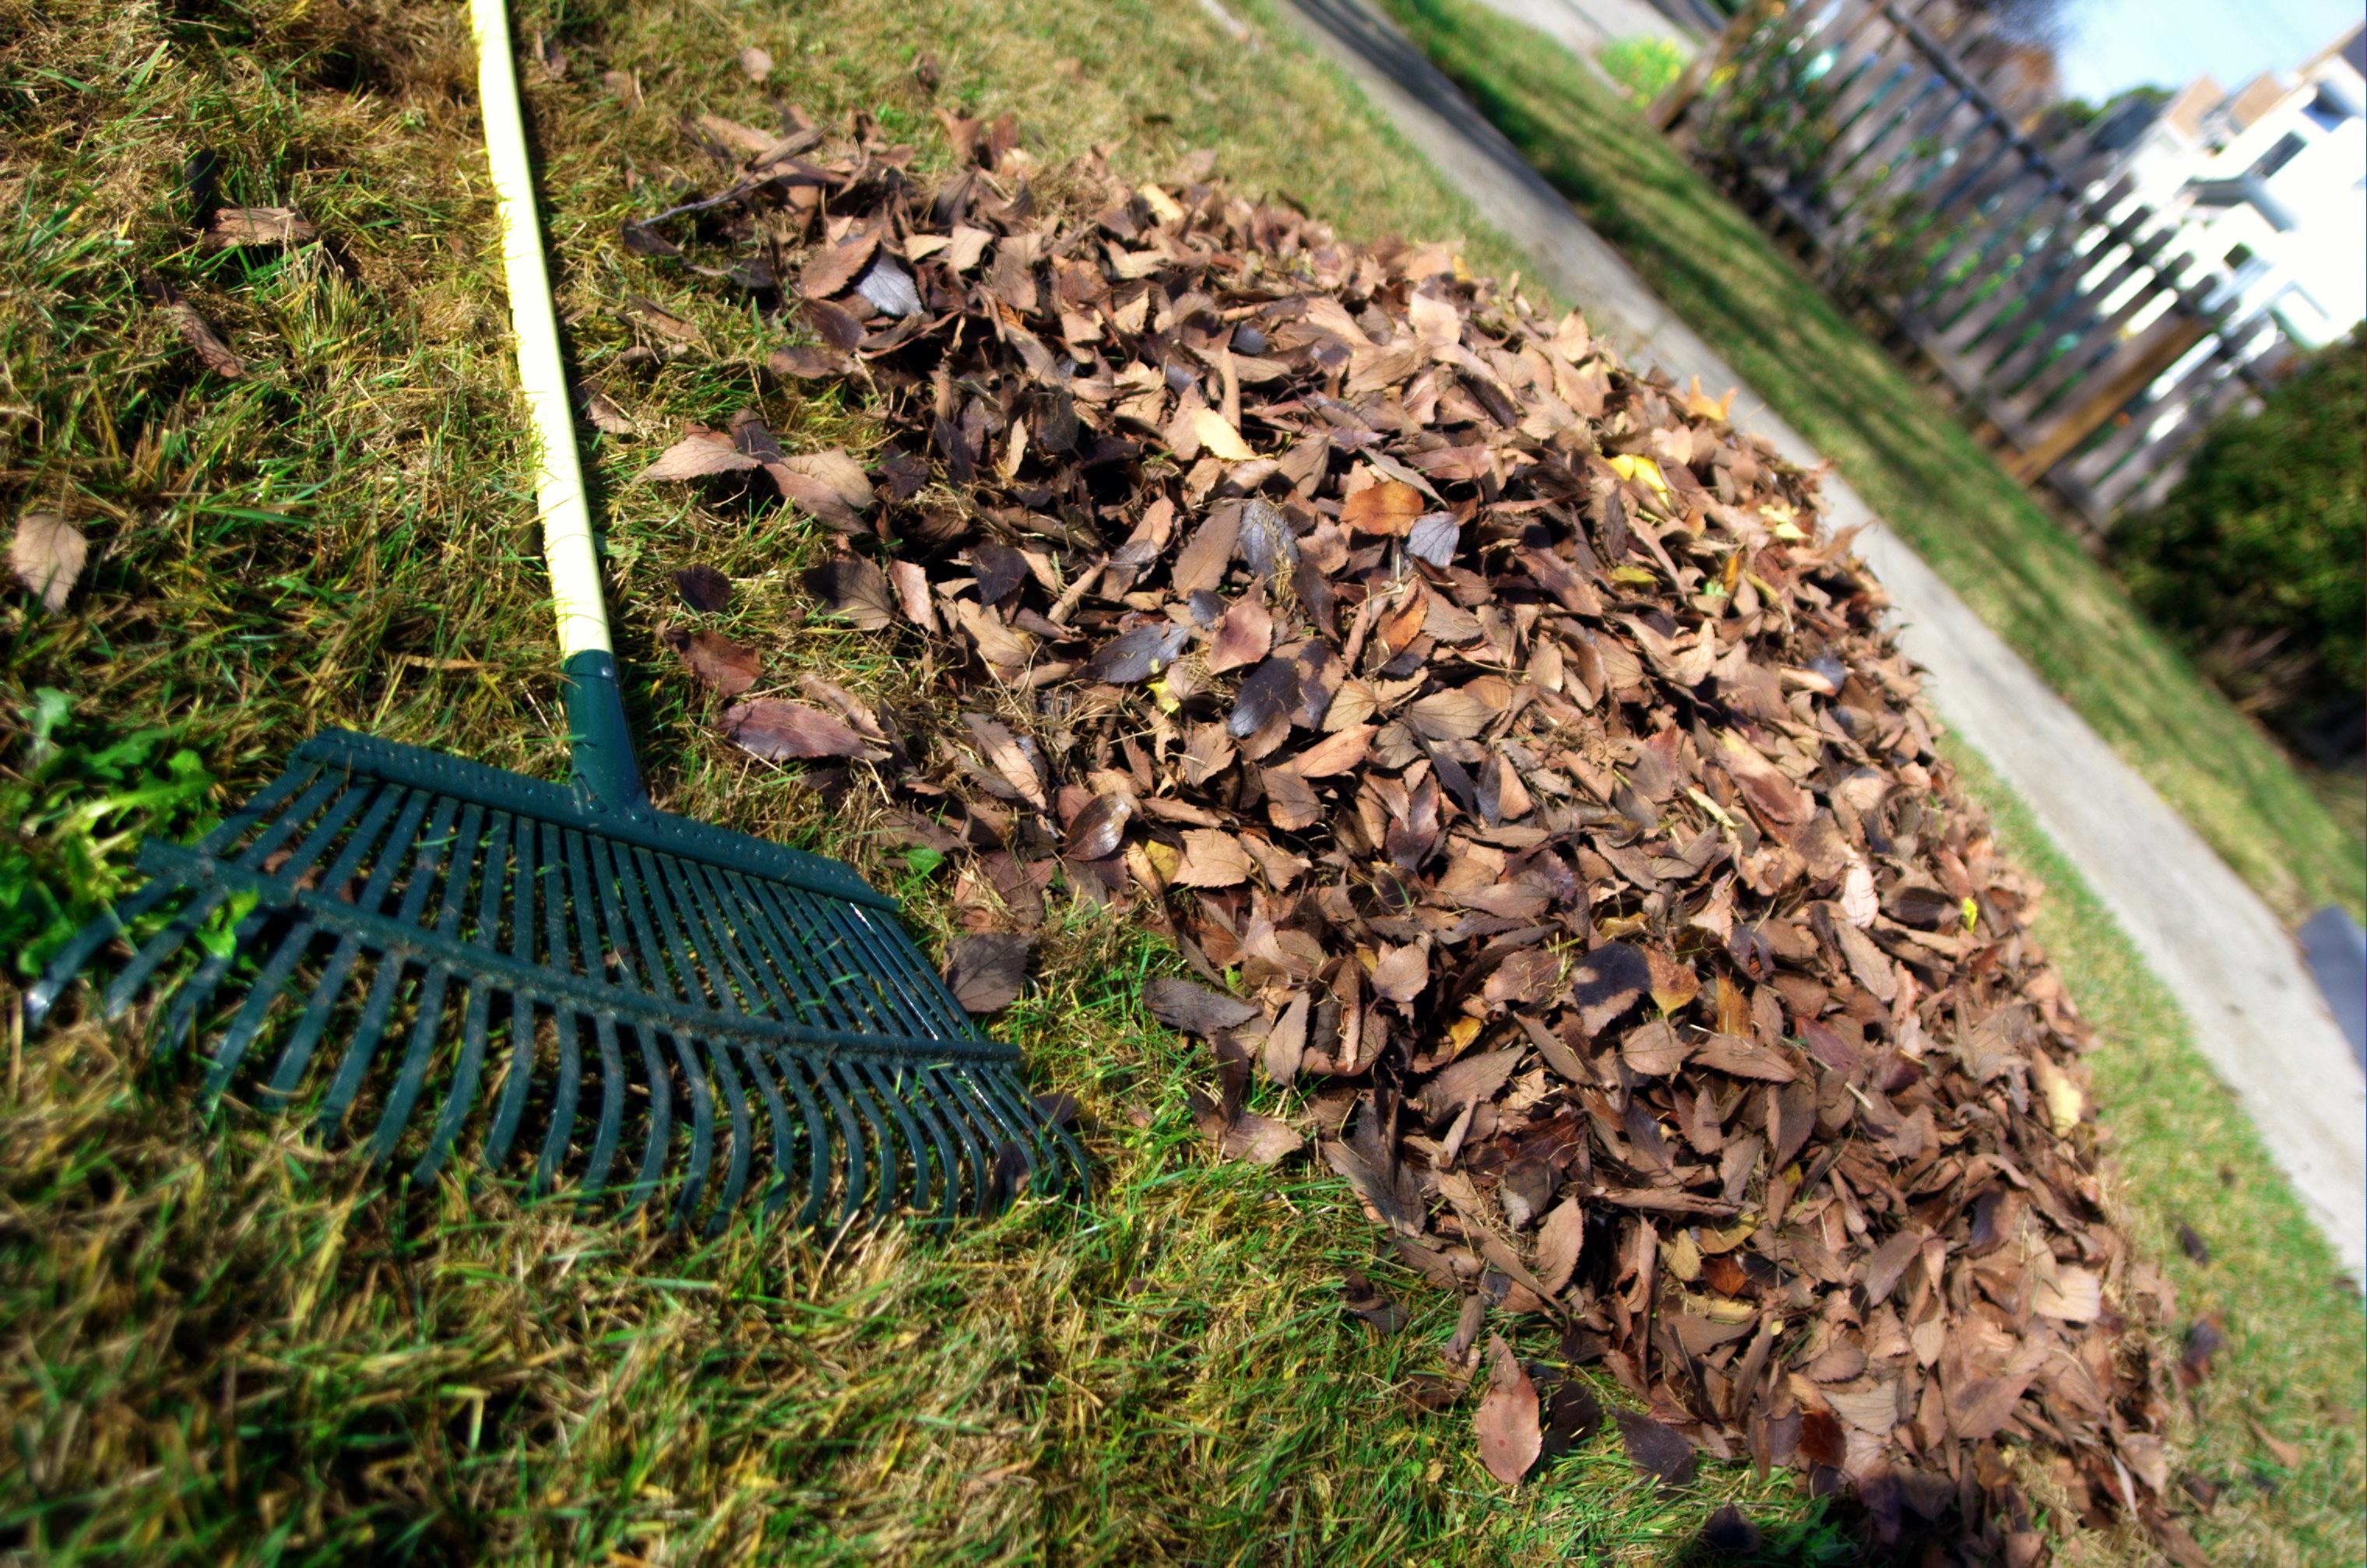 Artesia, CA - Official Website - Brush - Yard Waste